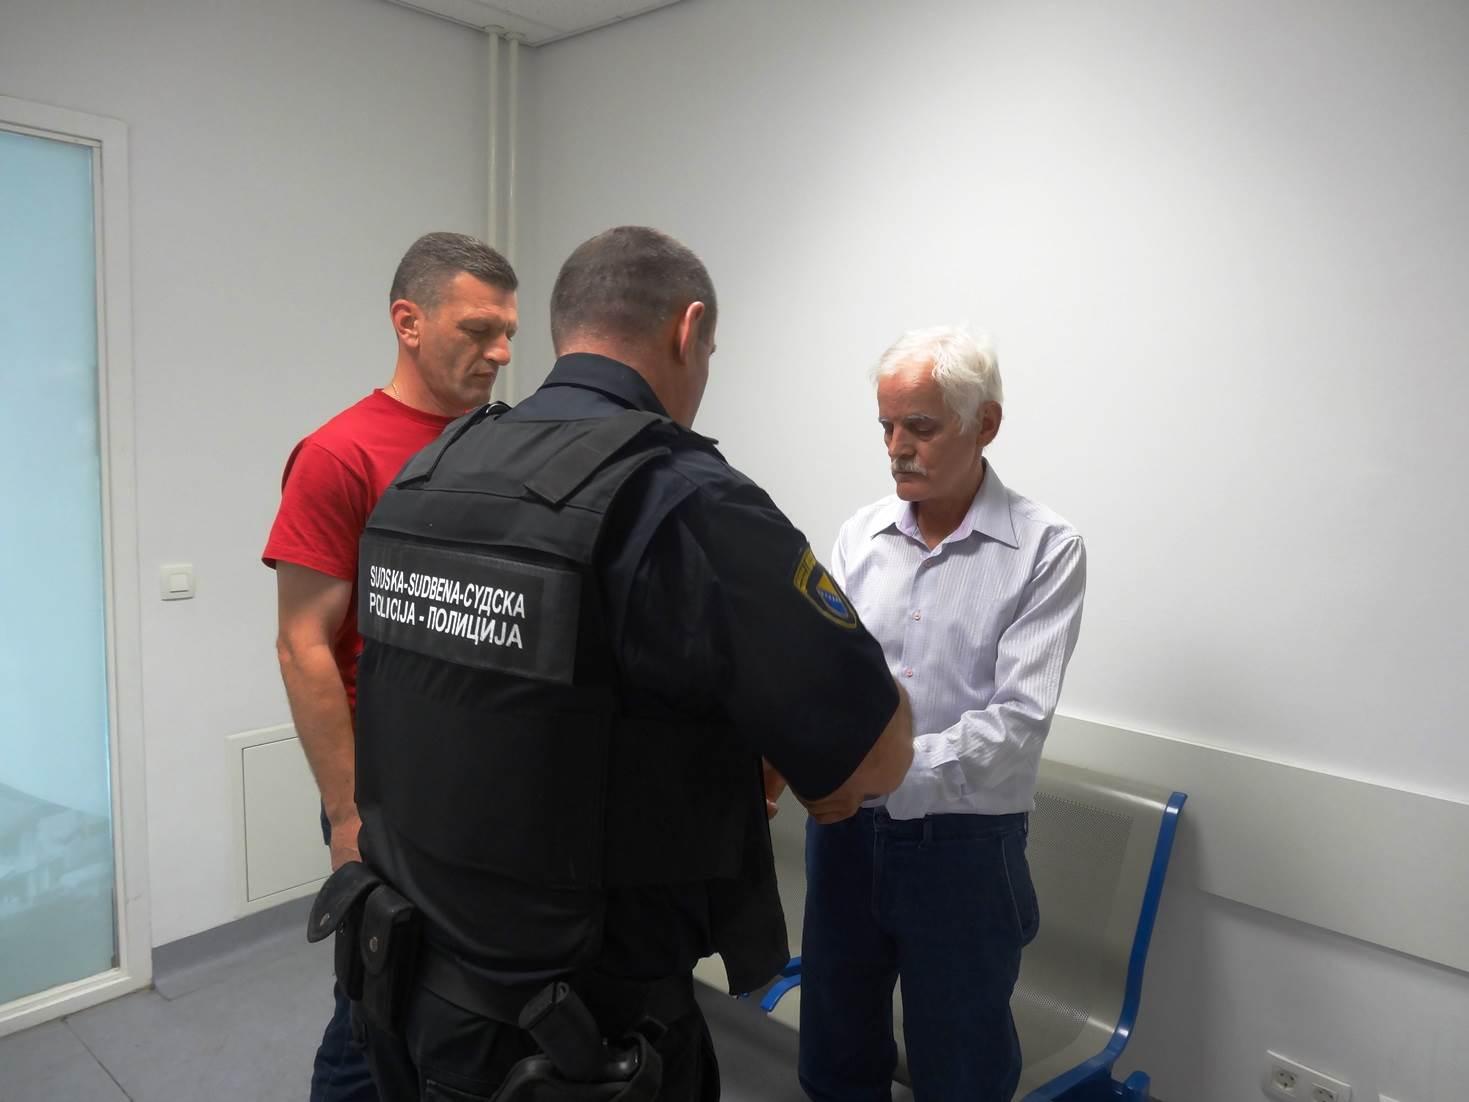 Bosnian Serb Fighter Convicted of Mass Killing in Visegrad